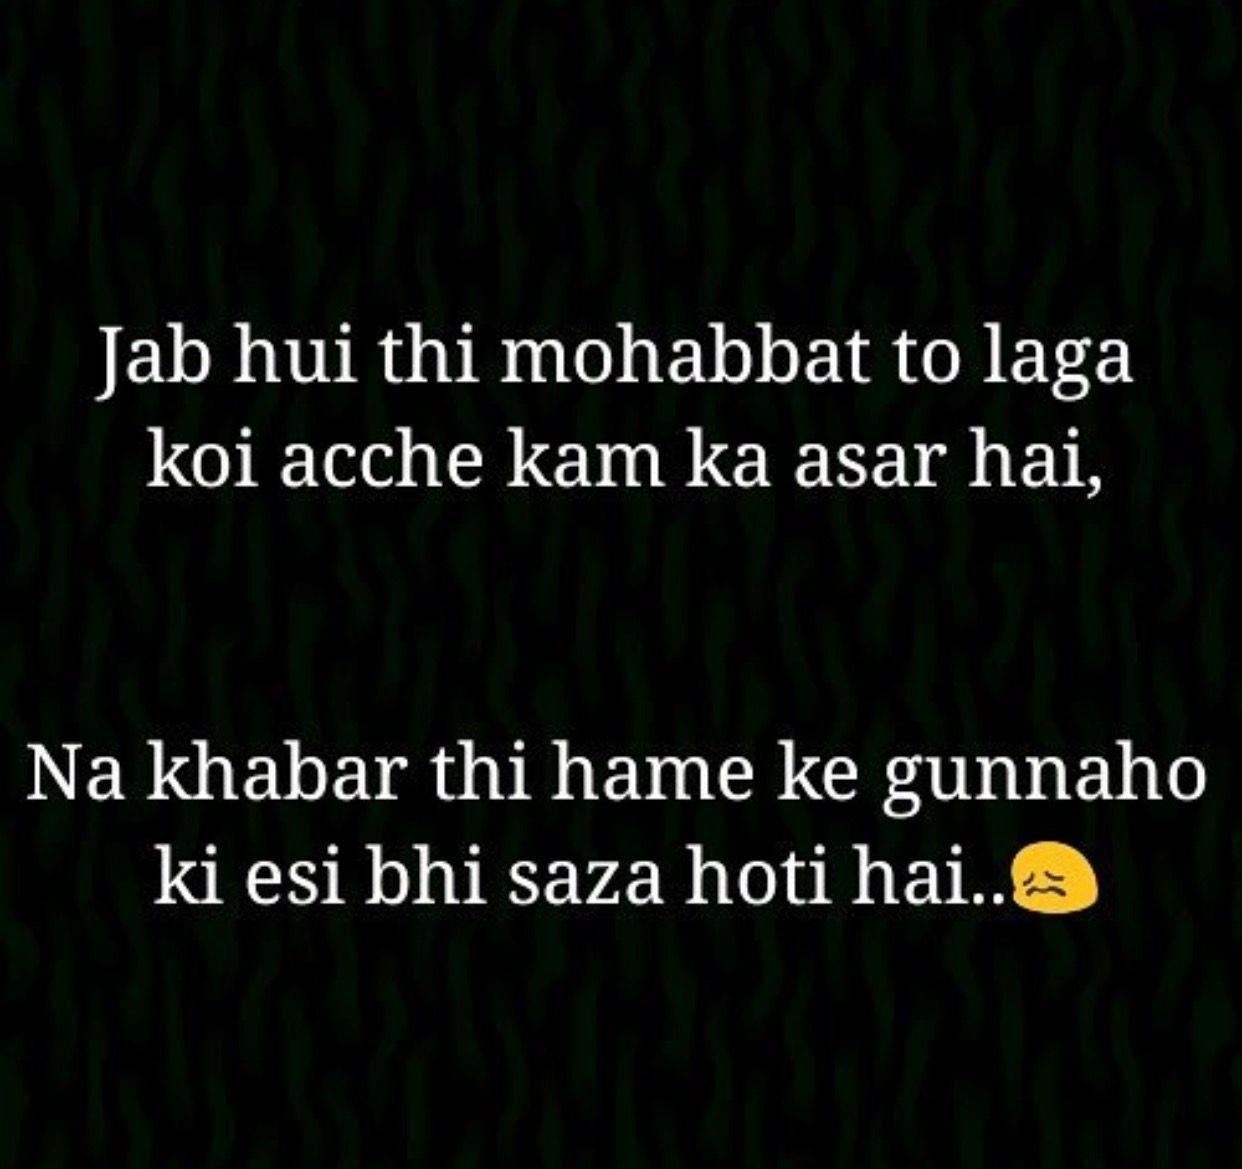 Hahahahaja galat kaam ka asar ta thts true koi for Koi 5 vigyapan in hindi